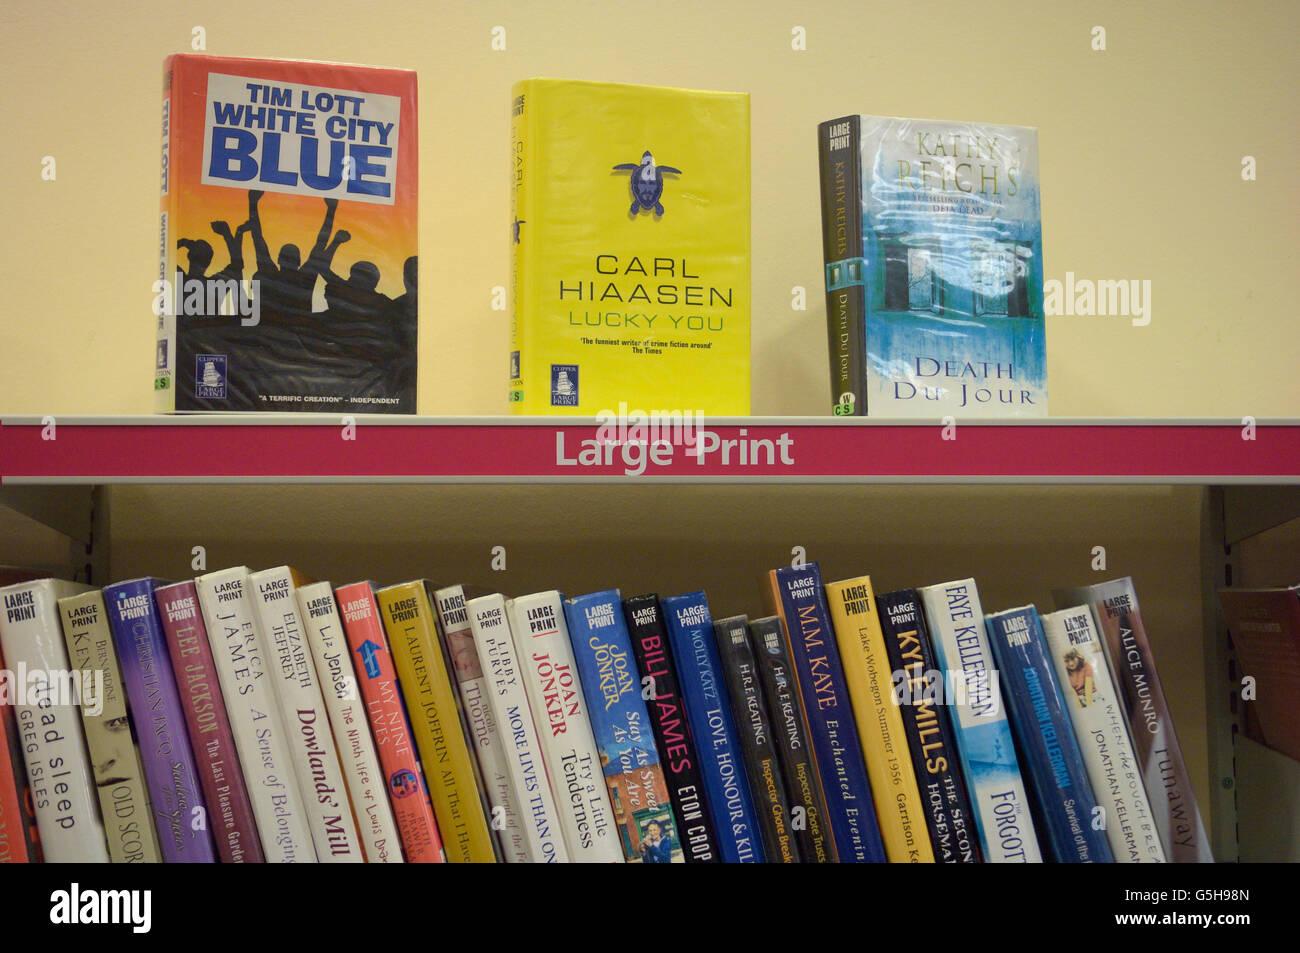 Public library large print book self. England. UK - Stock Image